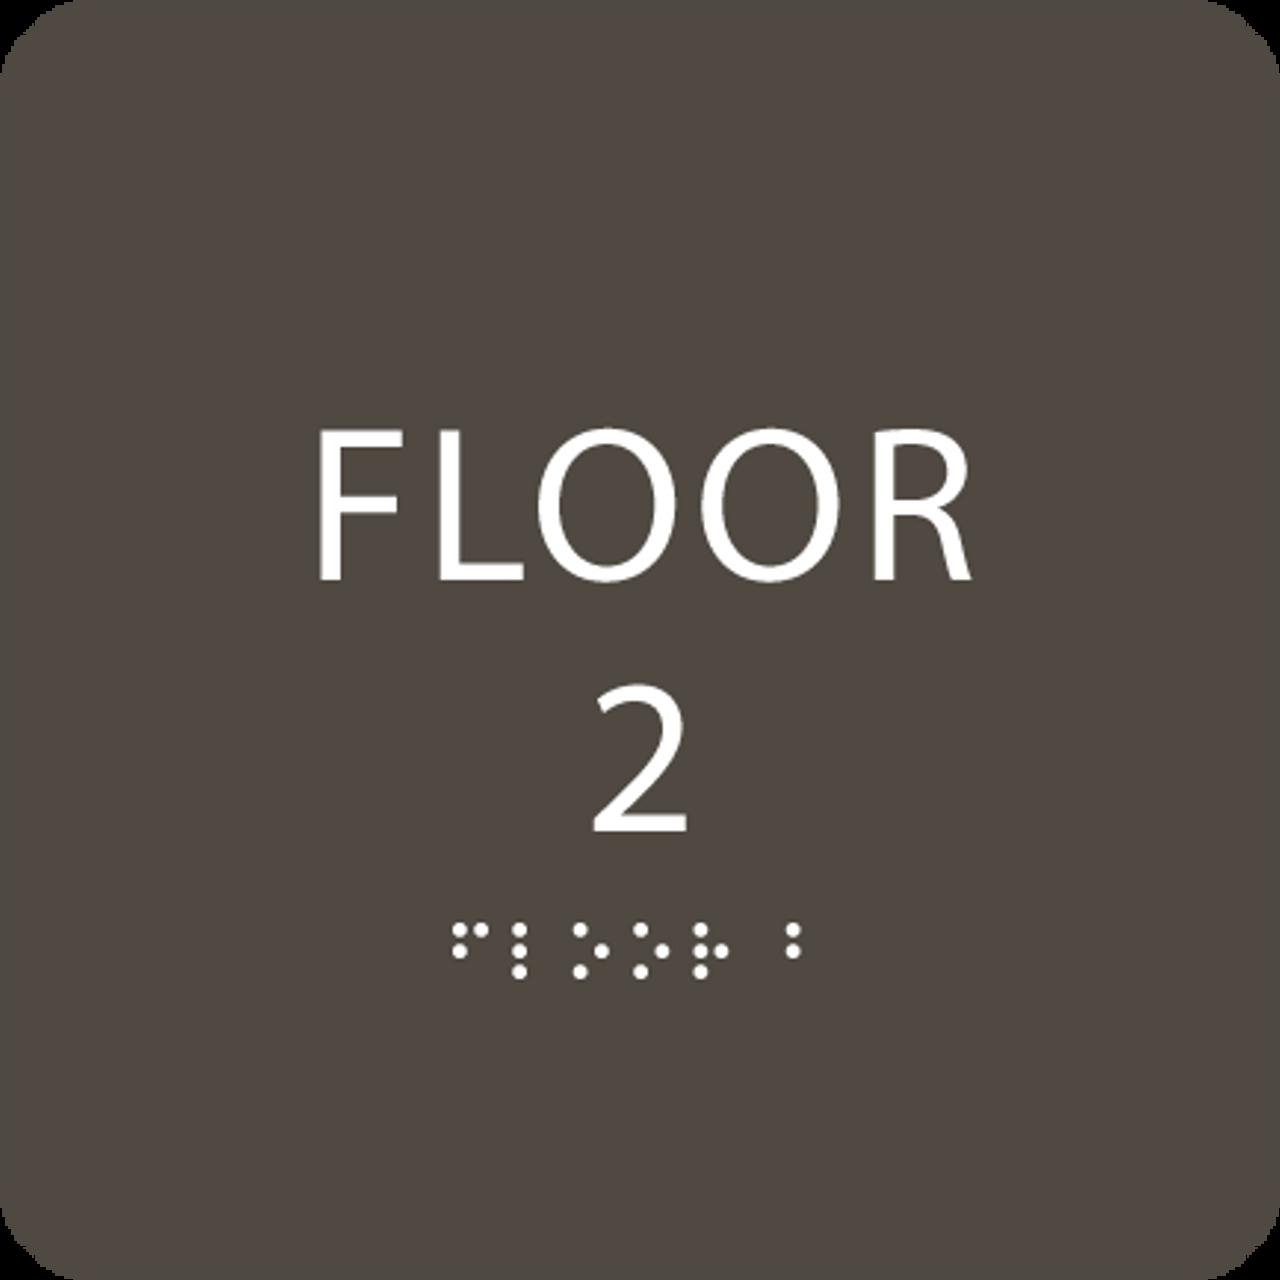 Olive Floor 2 Identification Sign